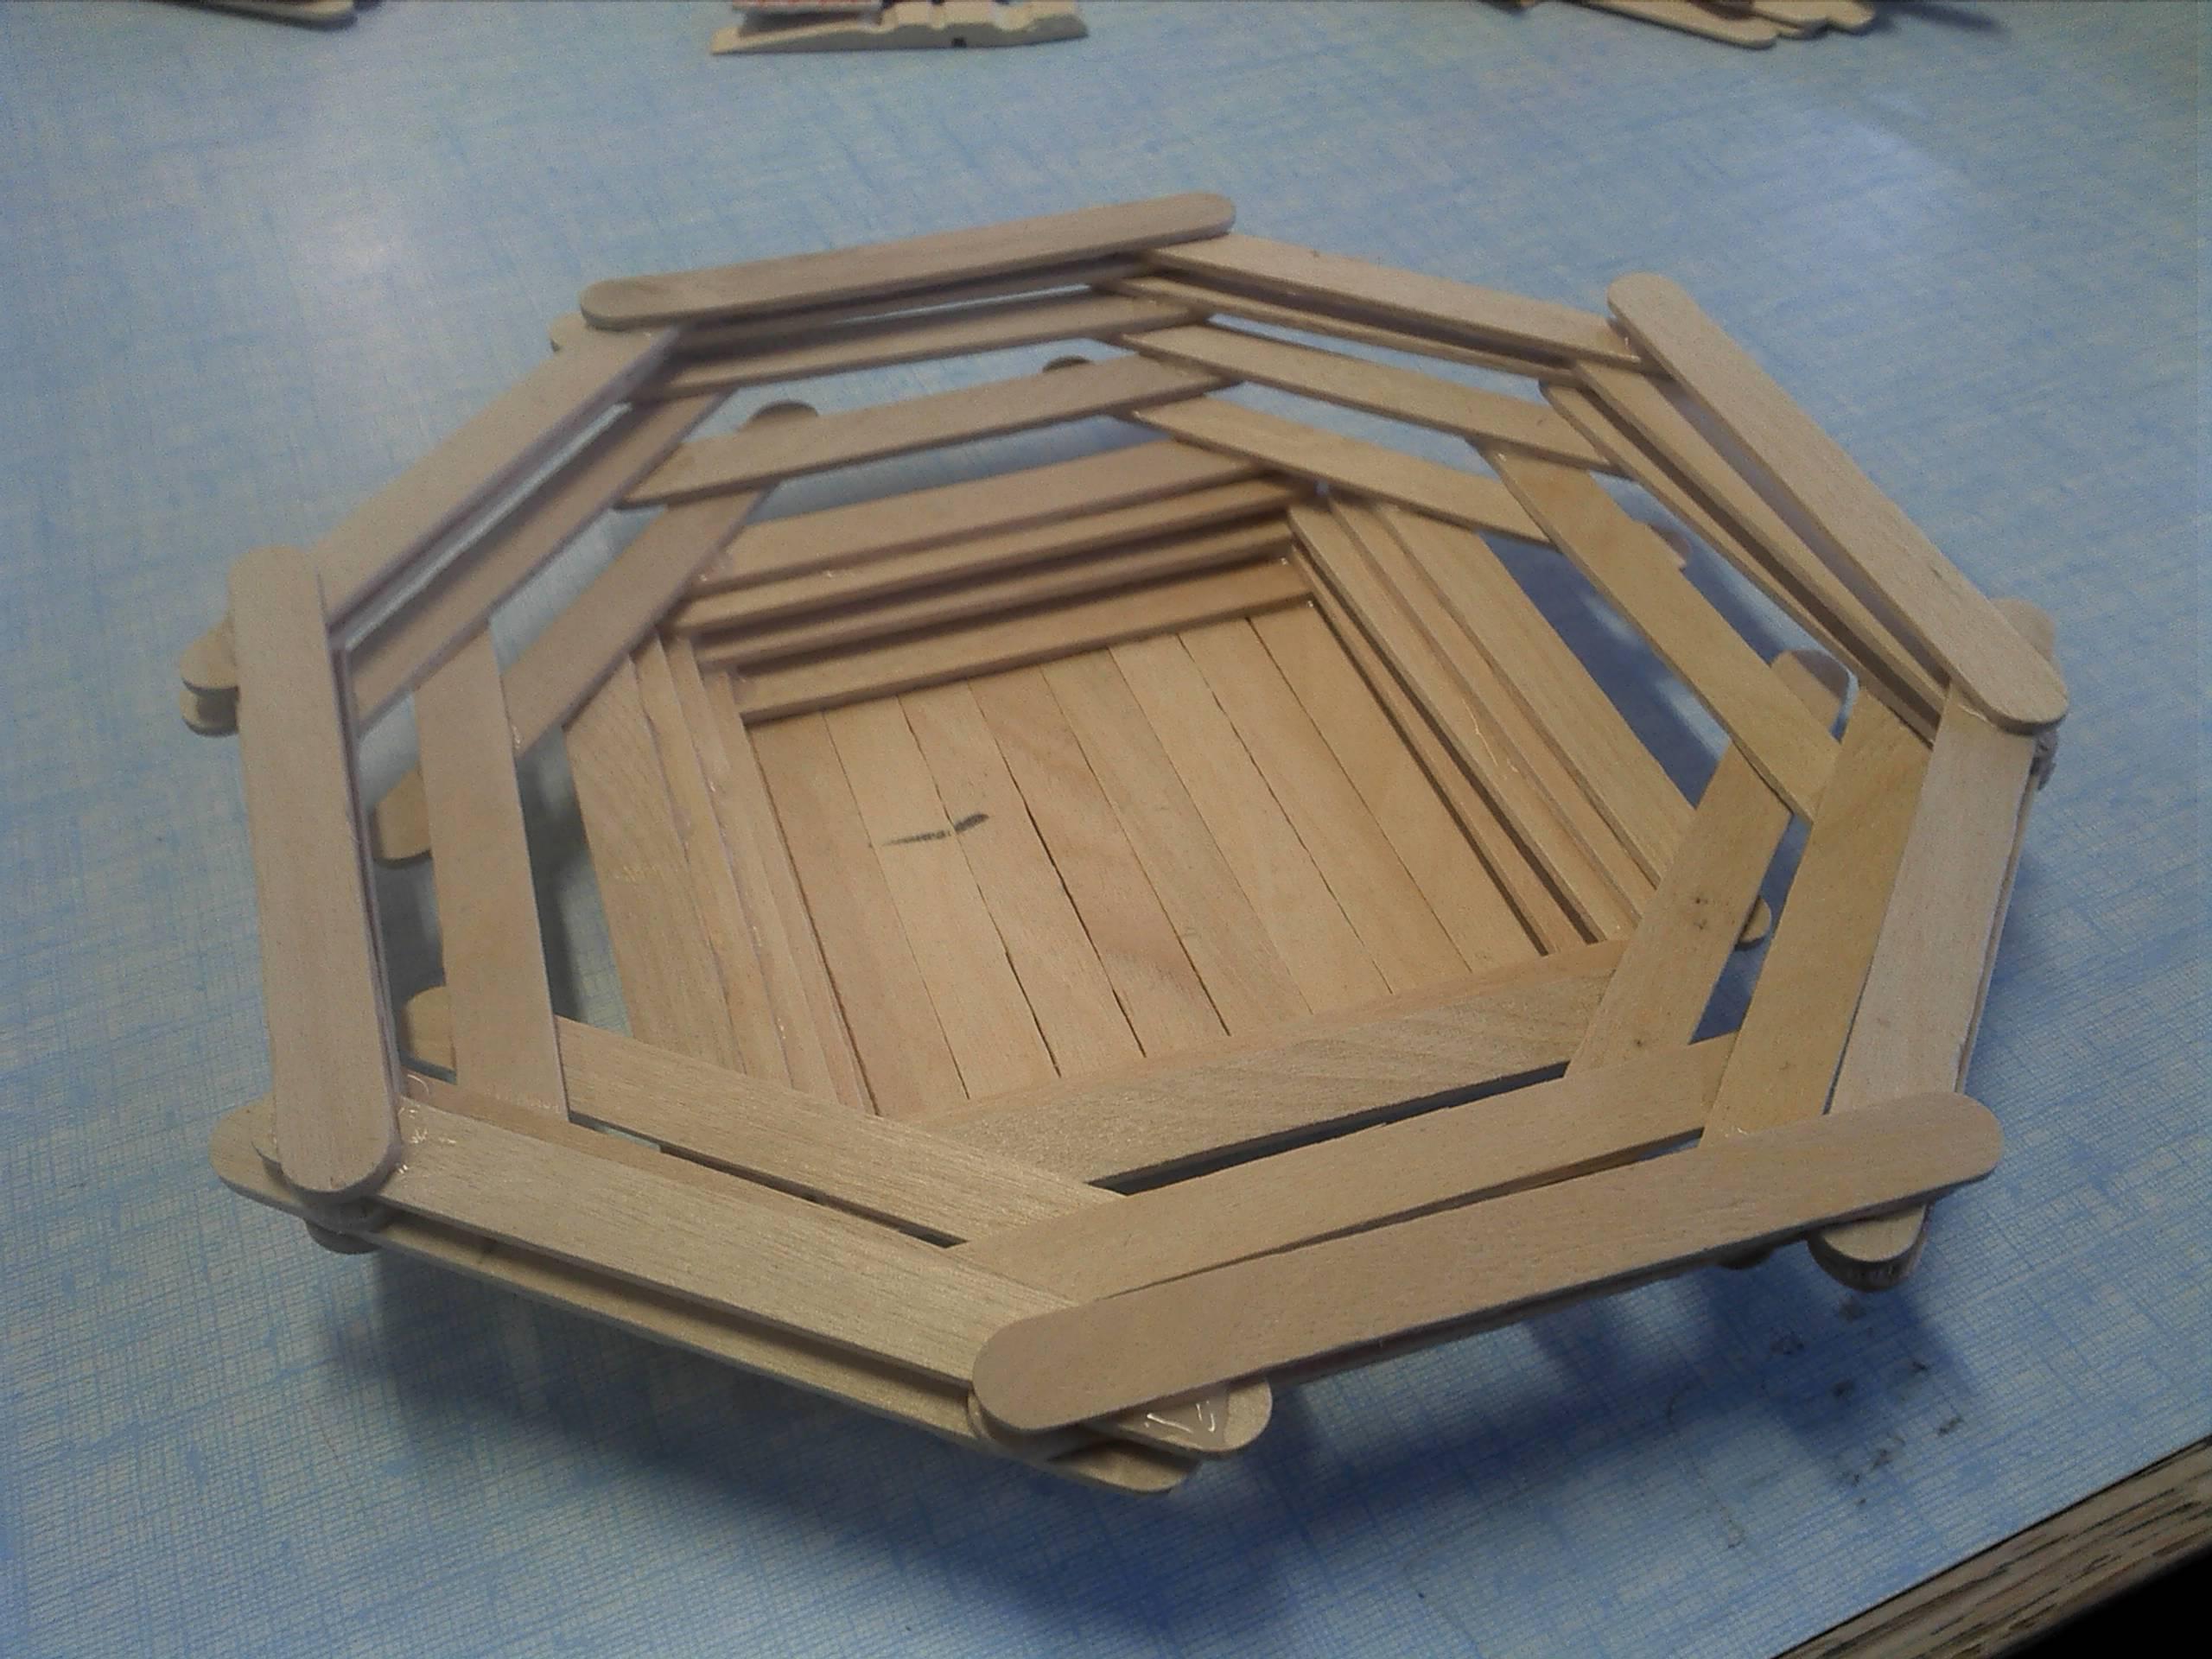 bricolage batonnets de glace. Black Bedroom Furniture Sets. Home Design Ideas